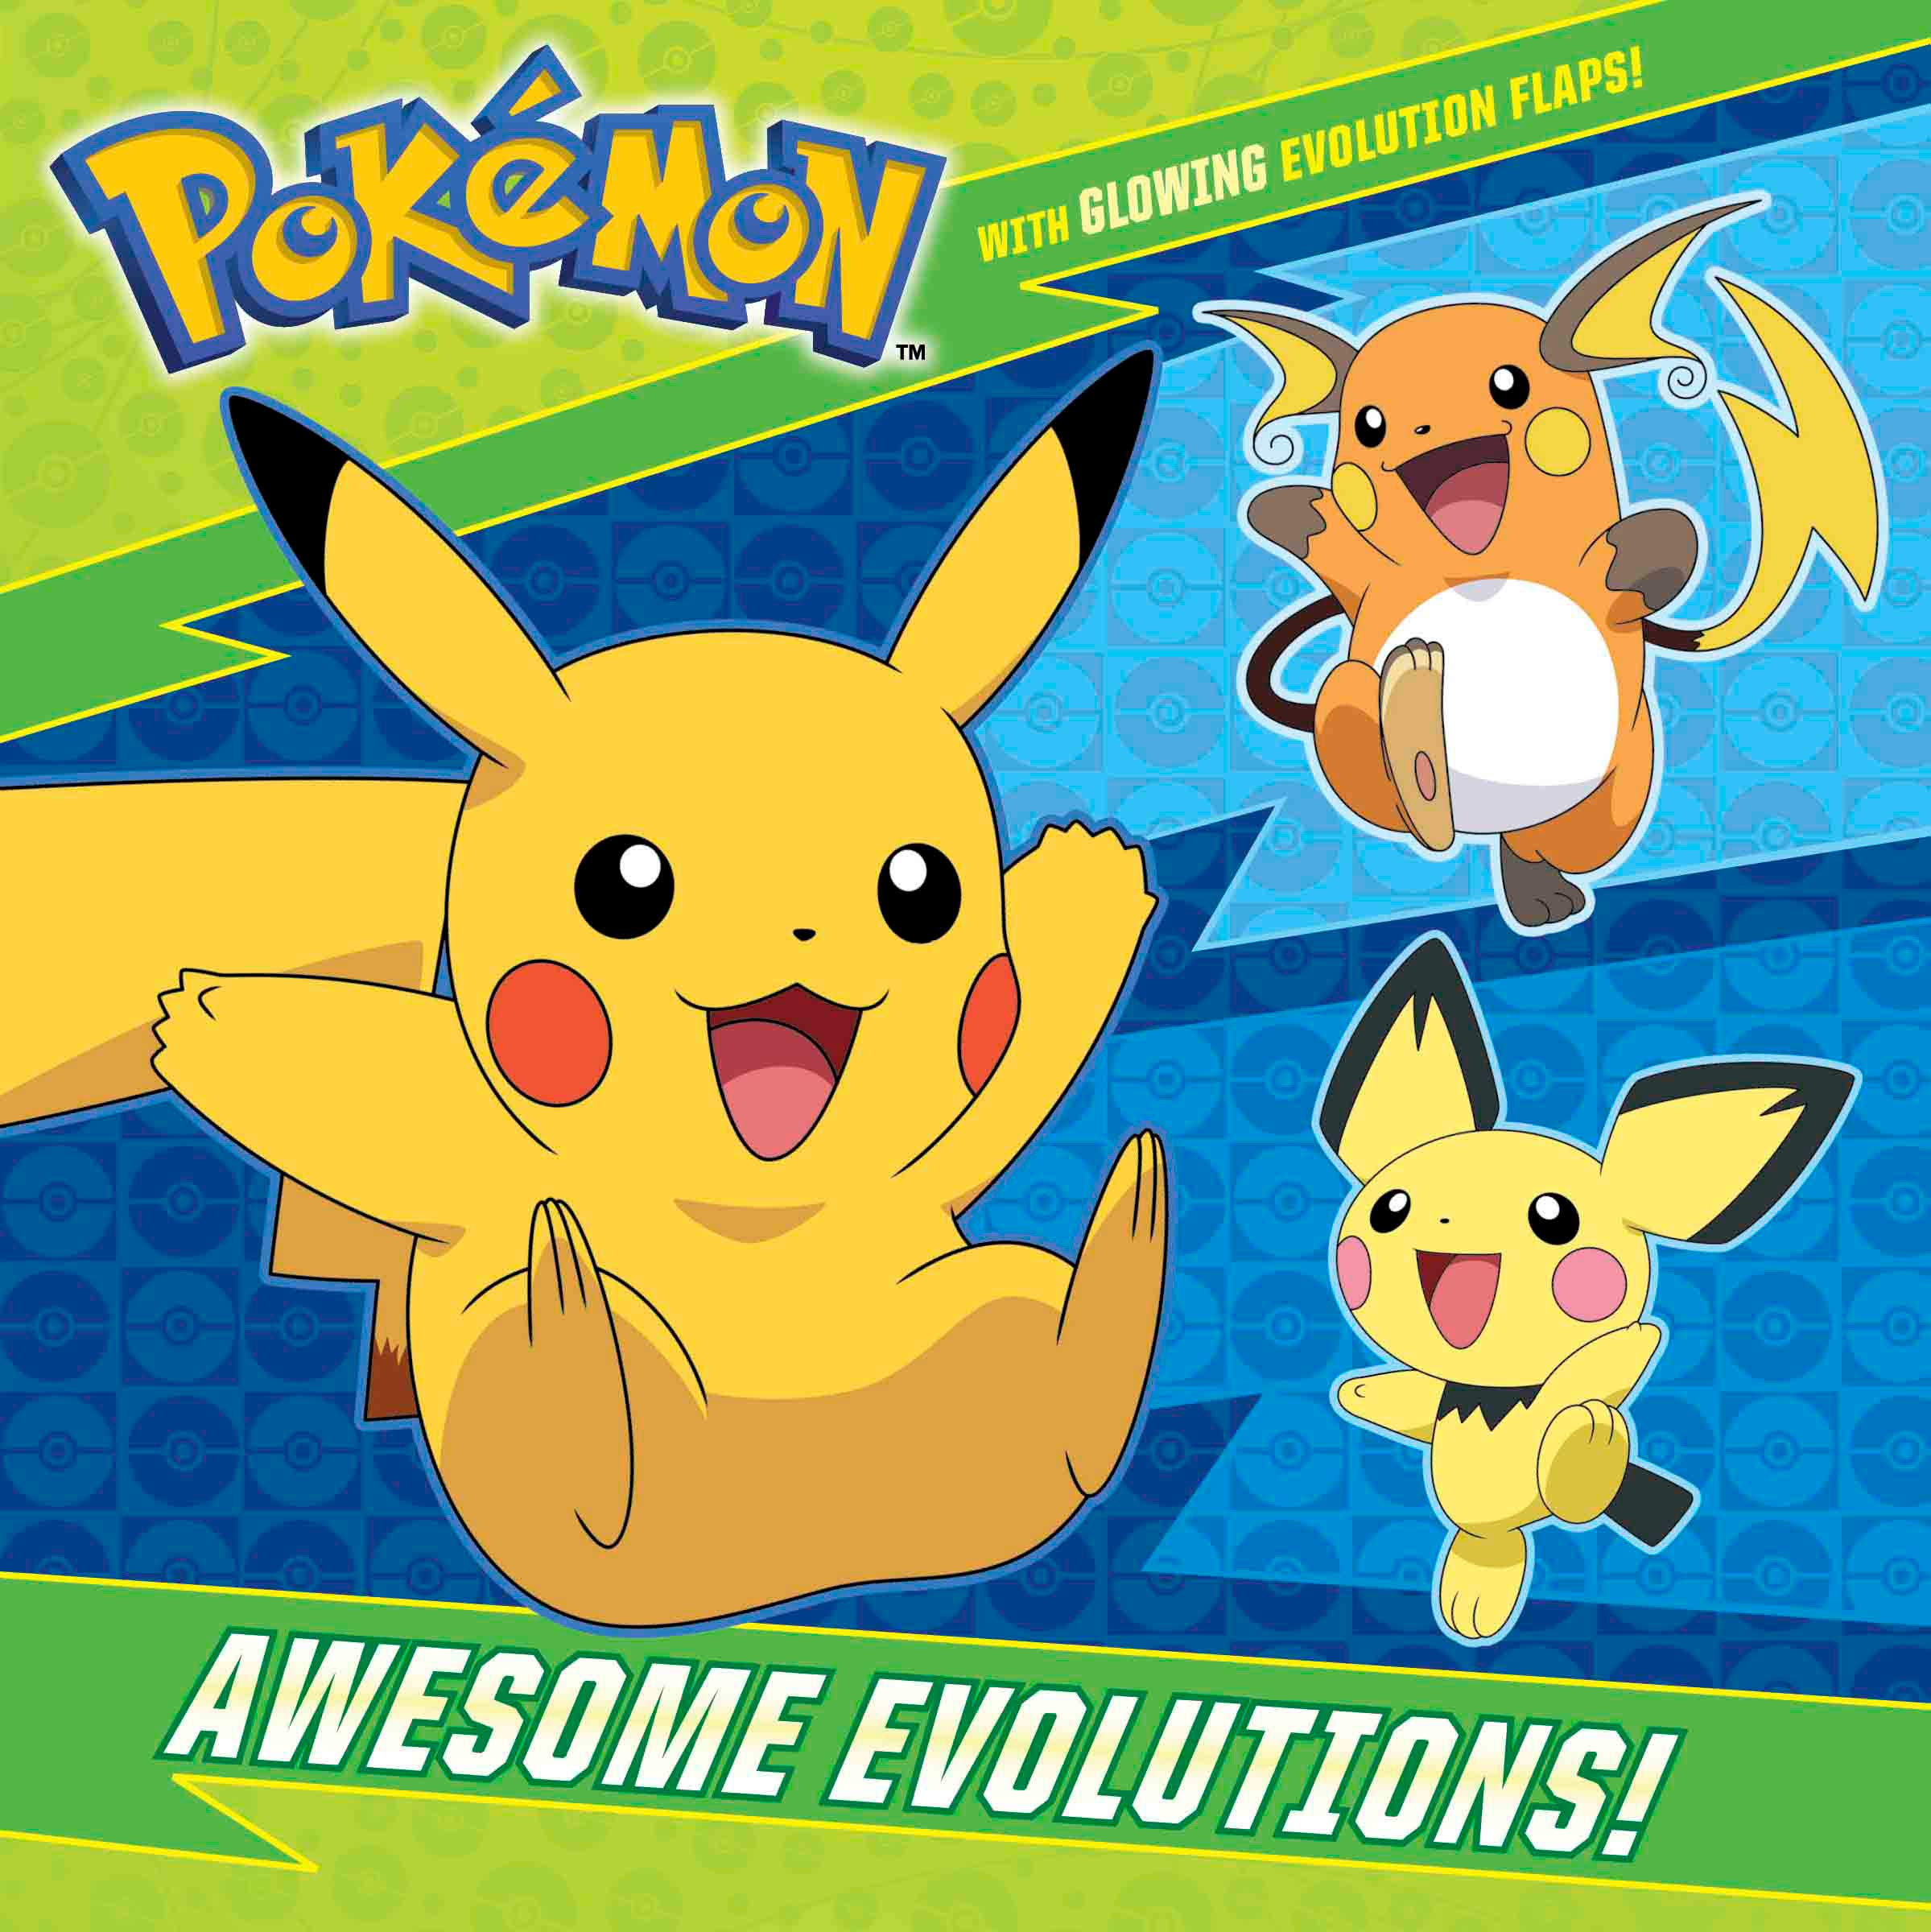 Awesome Evolutions! (Pokémon) (Pictureback(R)): Nestor, C. J., Random  House: 9781984848307: Amazon.com: Books